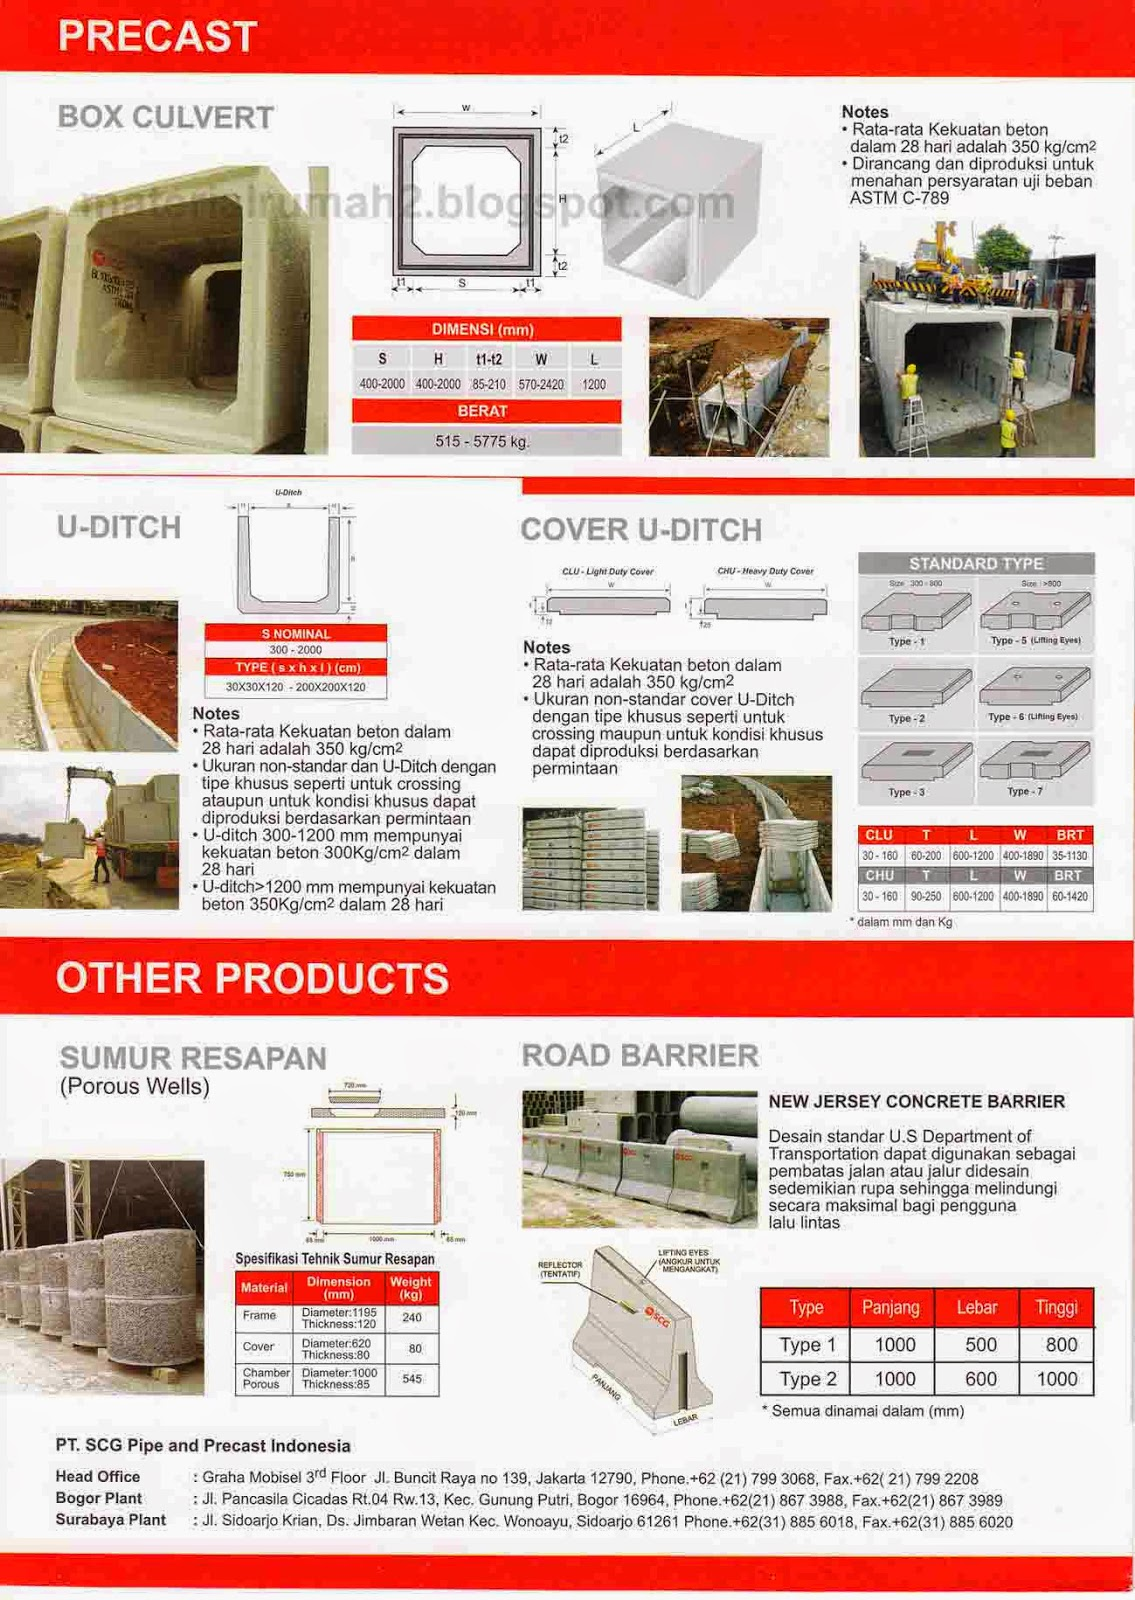 saluran beton precast dari scg pipe and precast indonesia